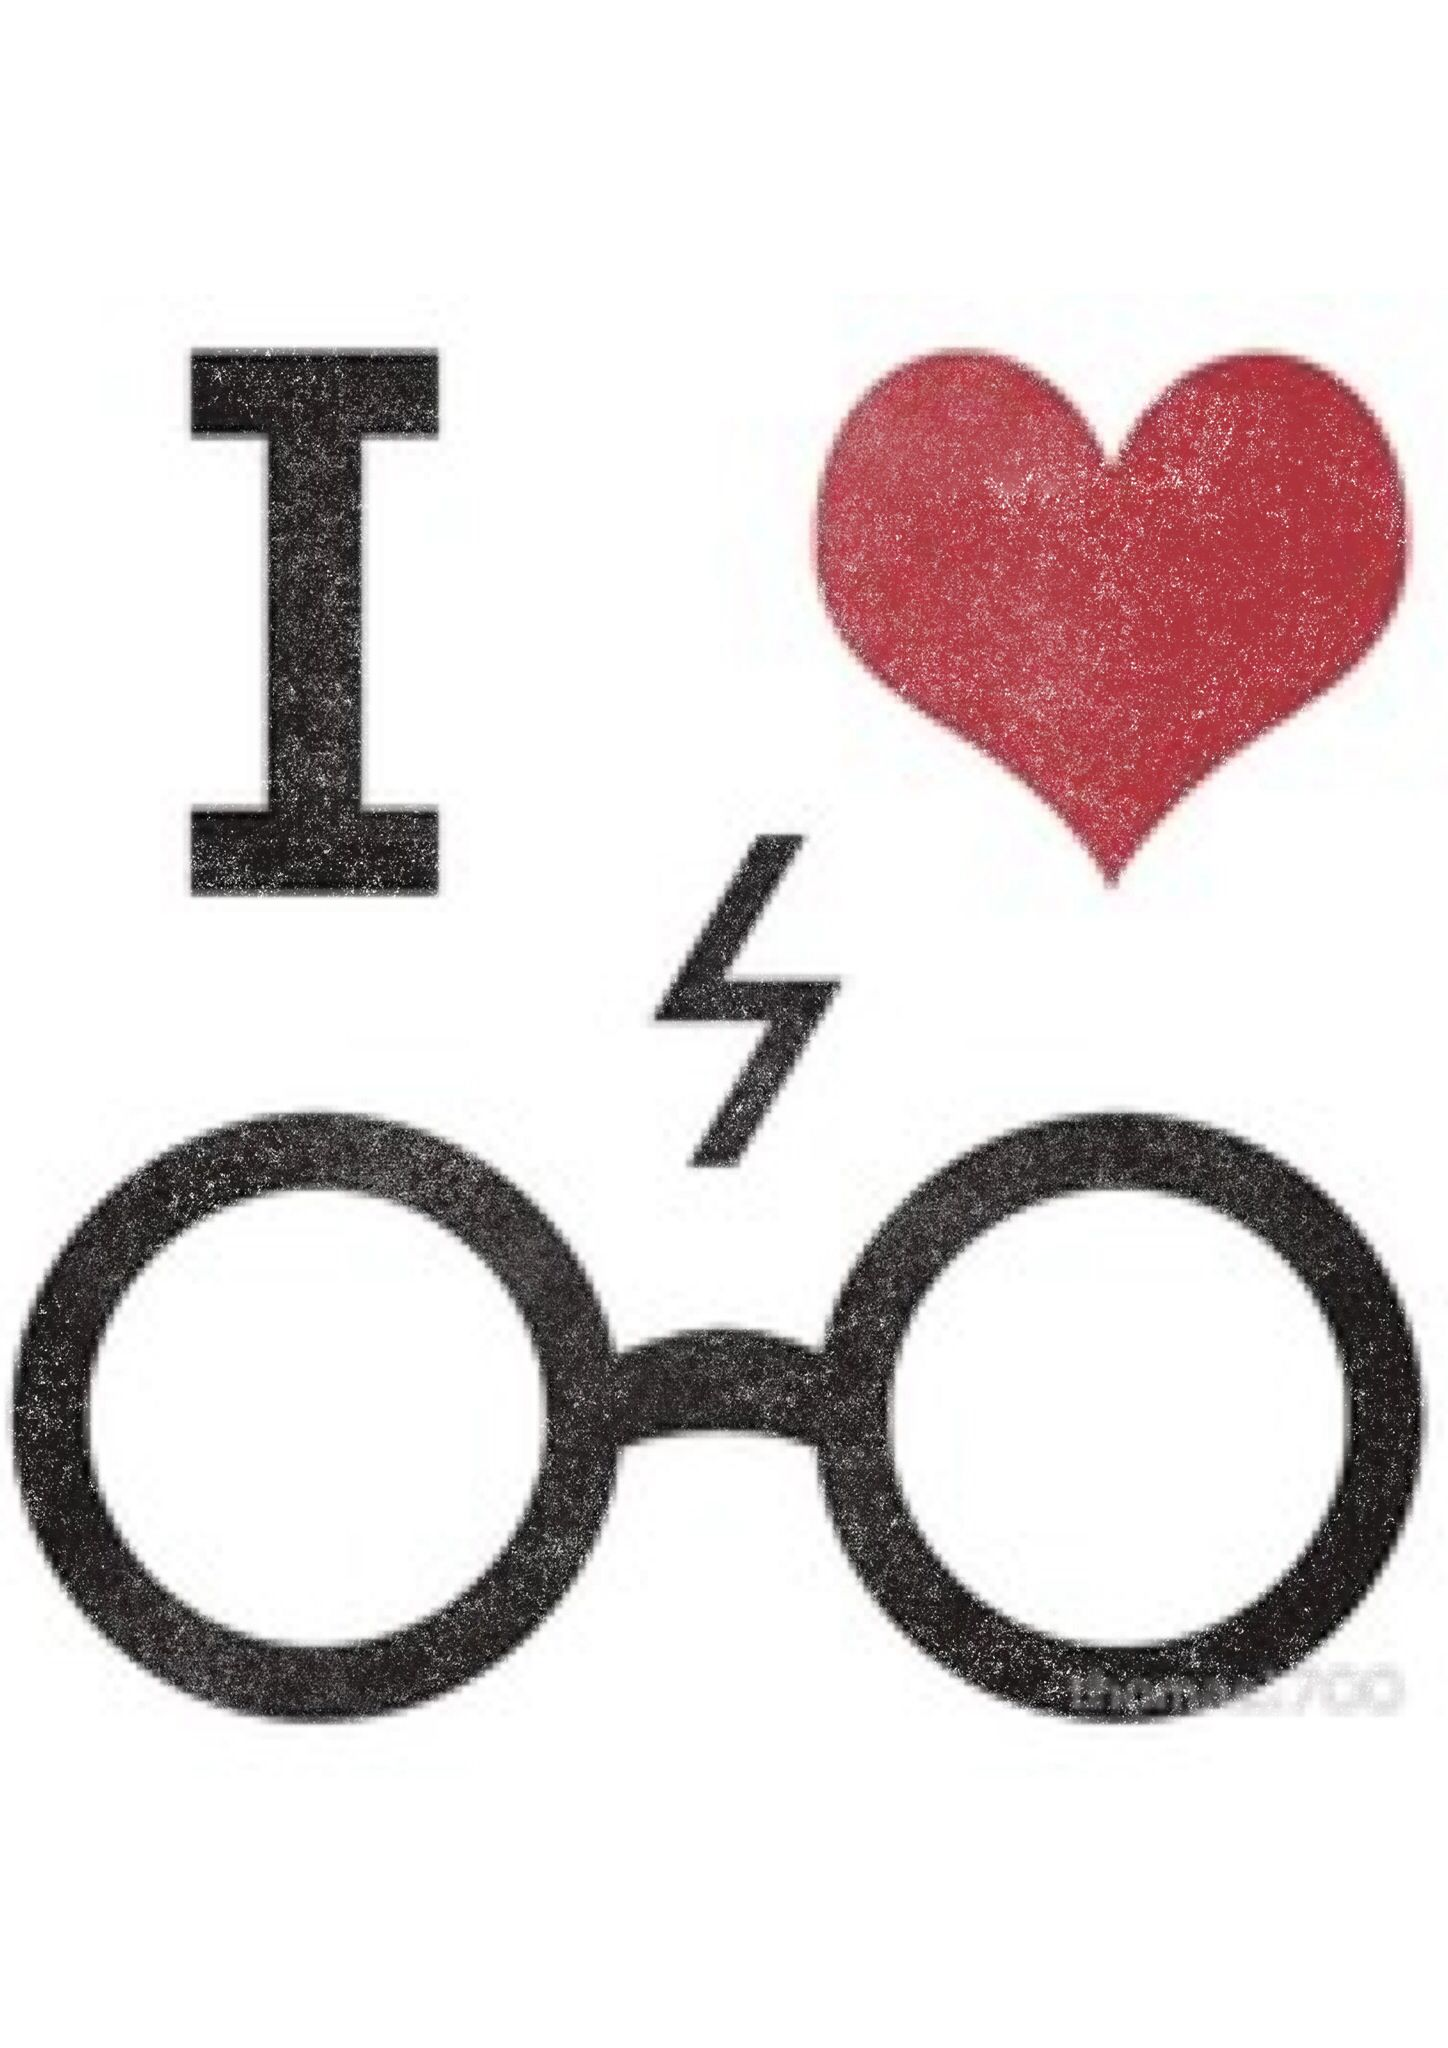 Popular Wallpaper Harry Potter Note 5 - e10511b35cbbf16aca5c11db420b4f75  Trends_707155.jpg